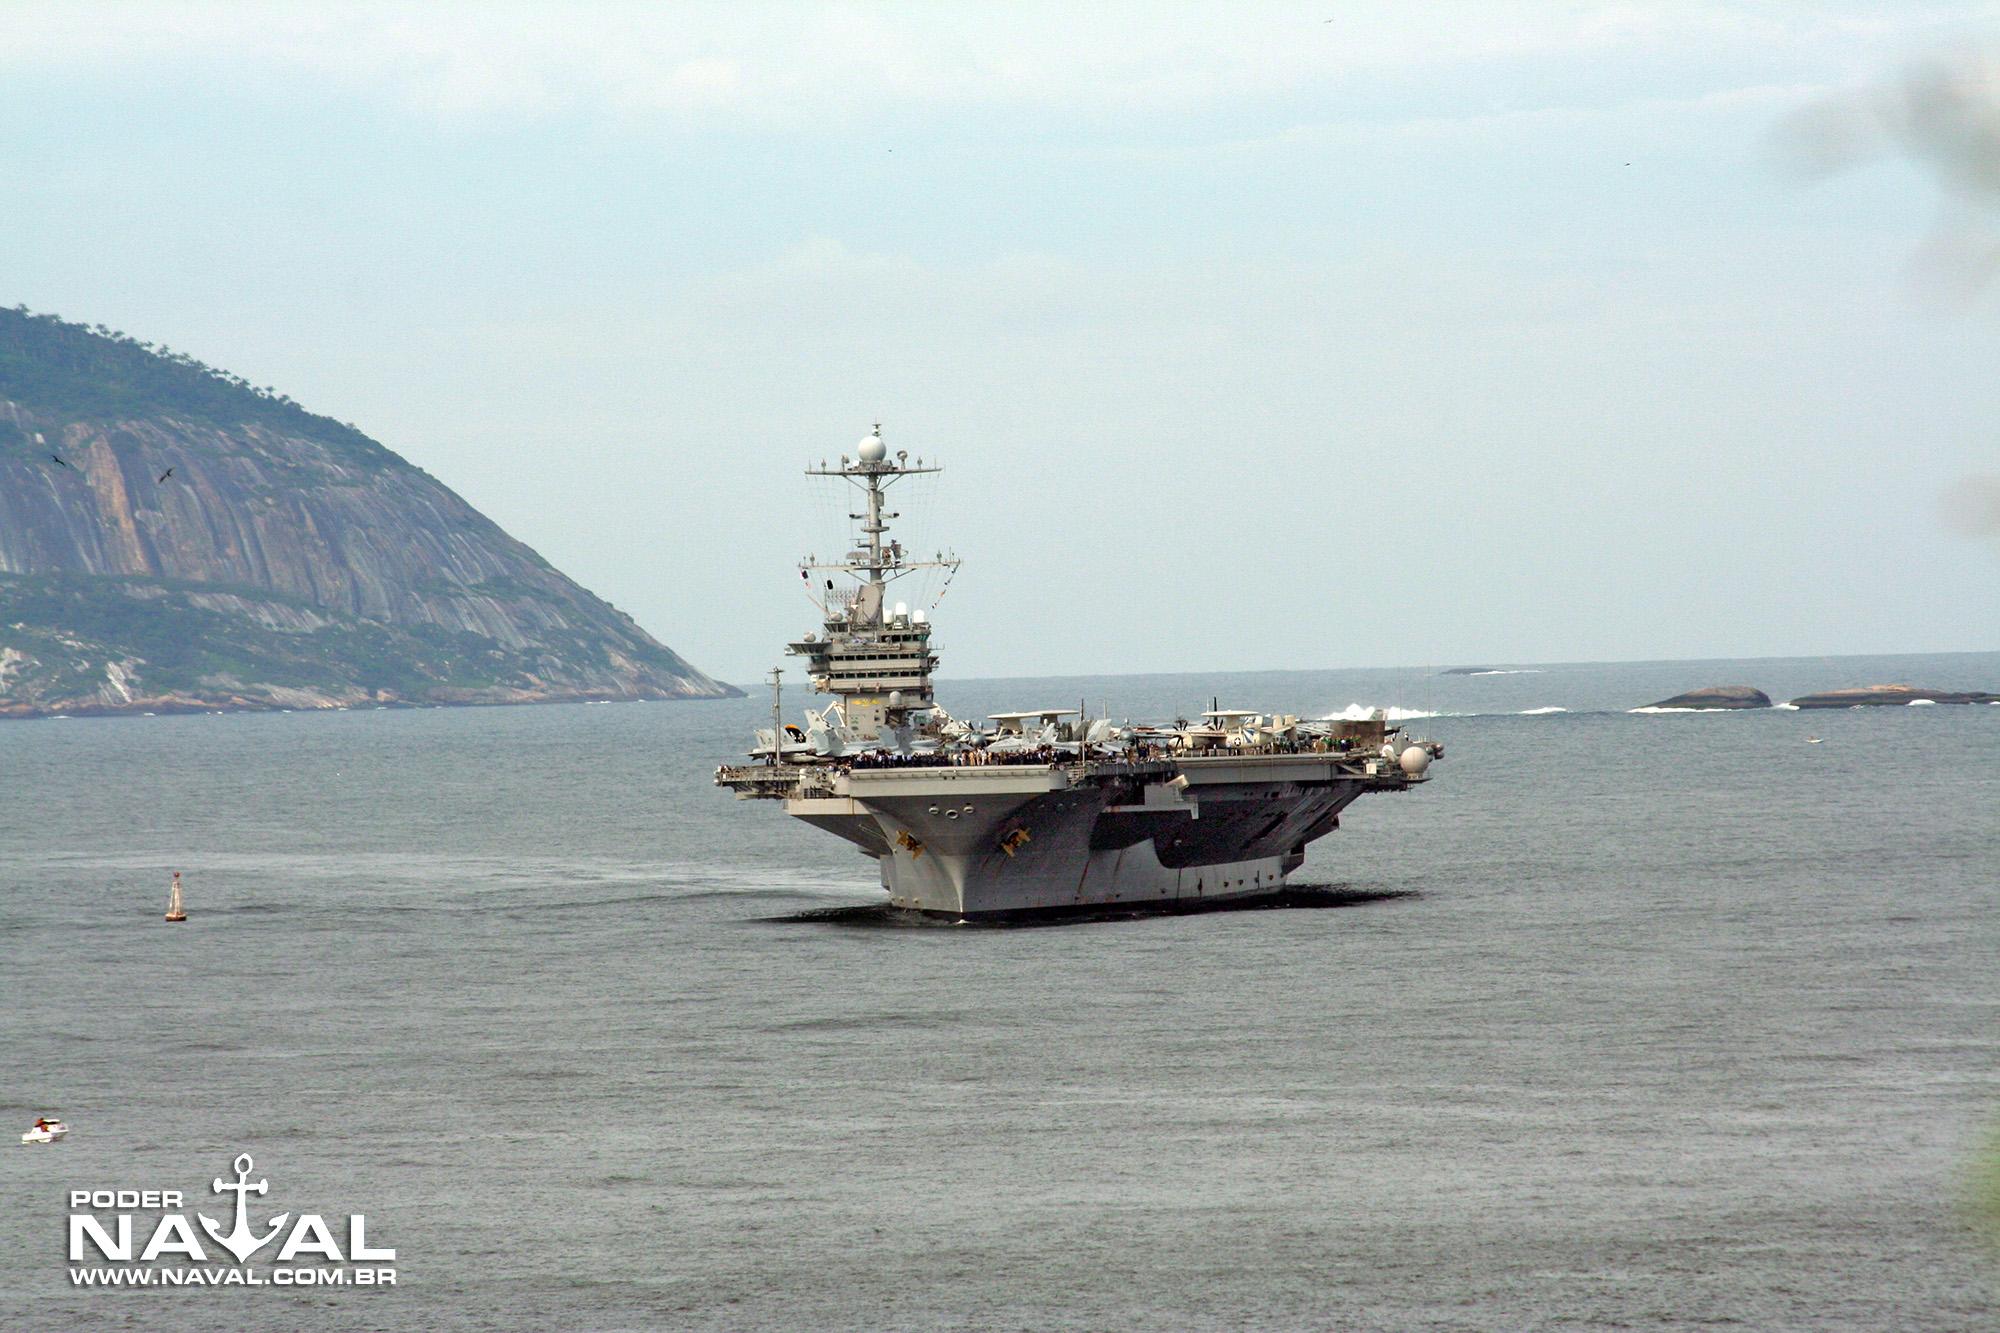 USS George Washington (CVN-73) no Rio - 2008 - 4